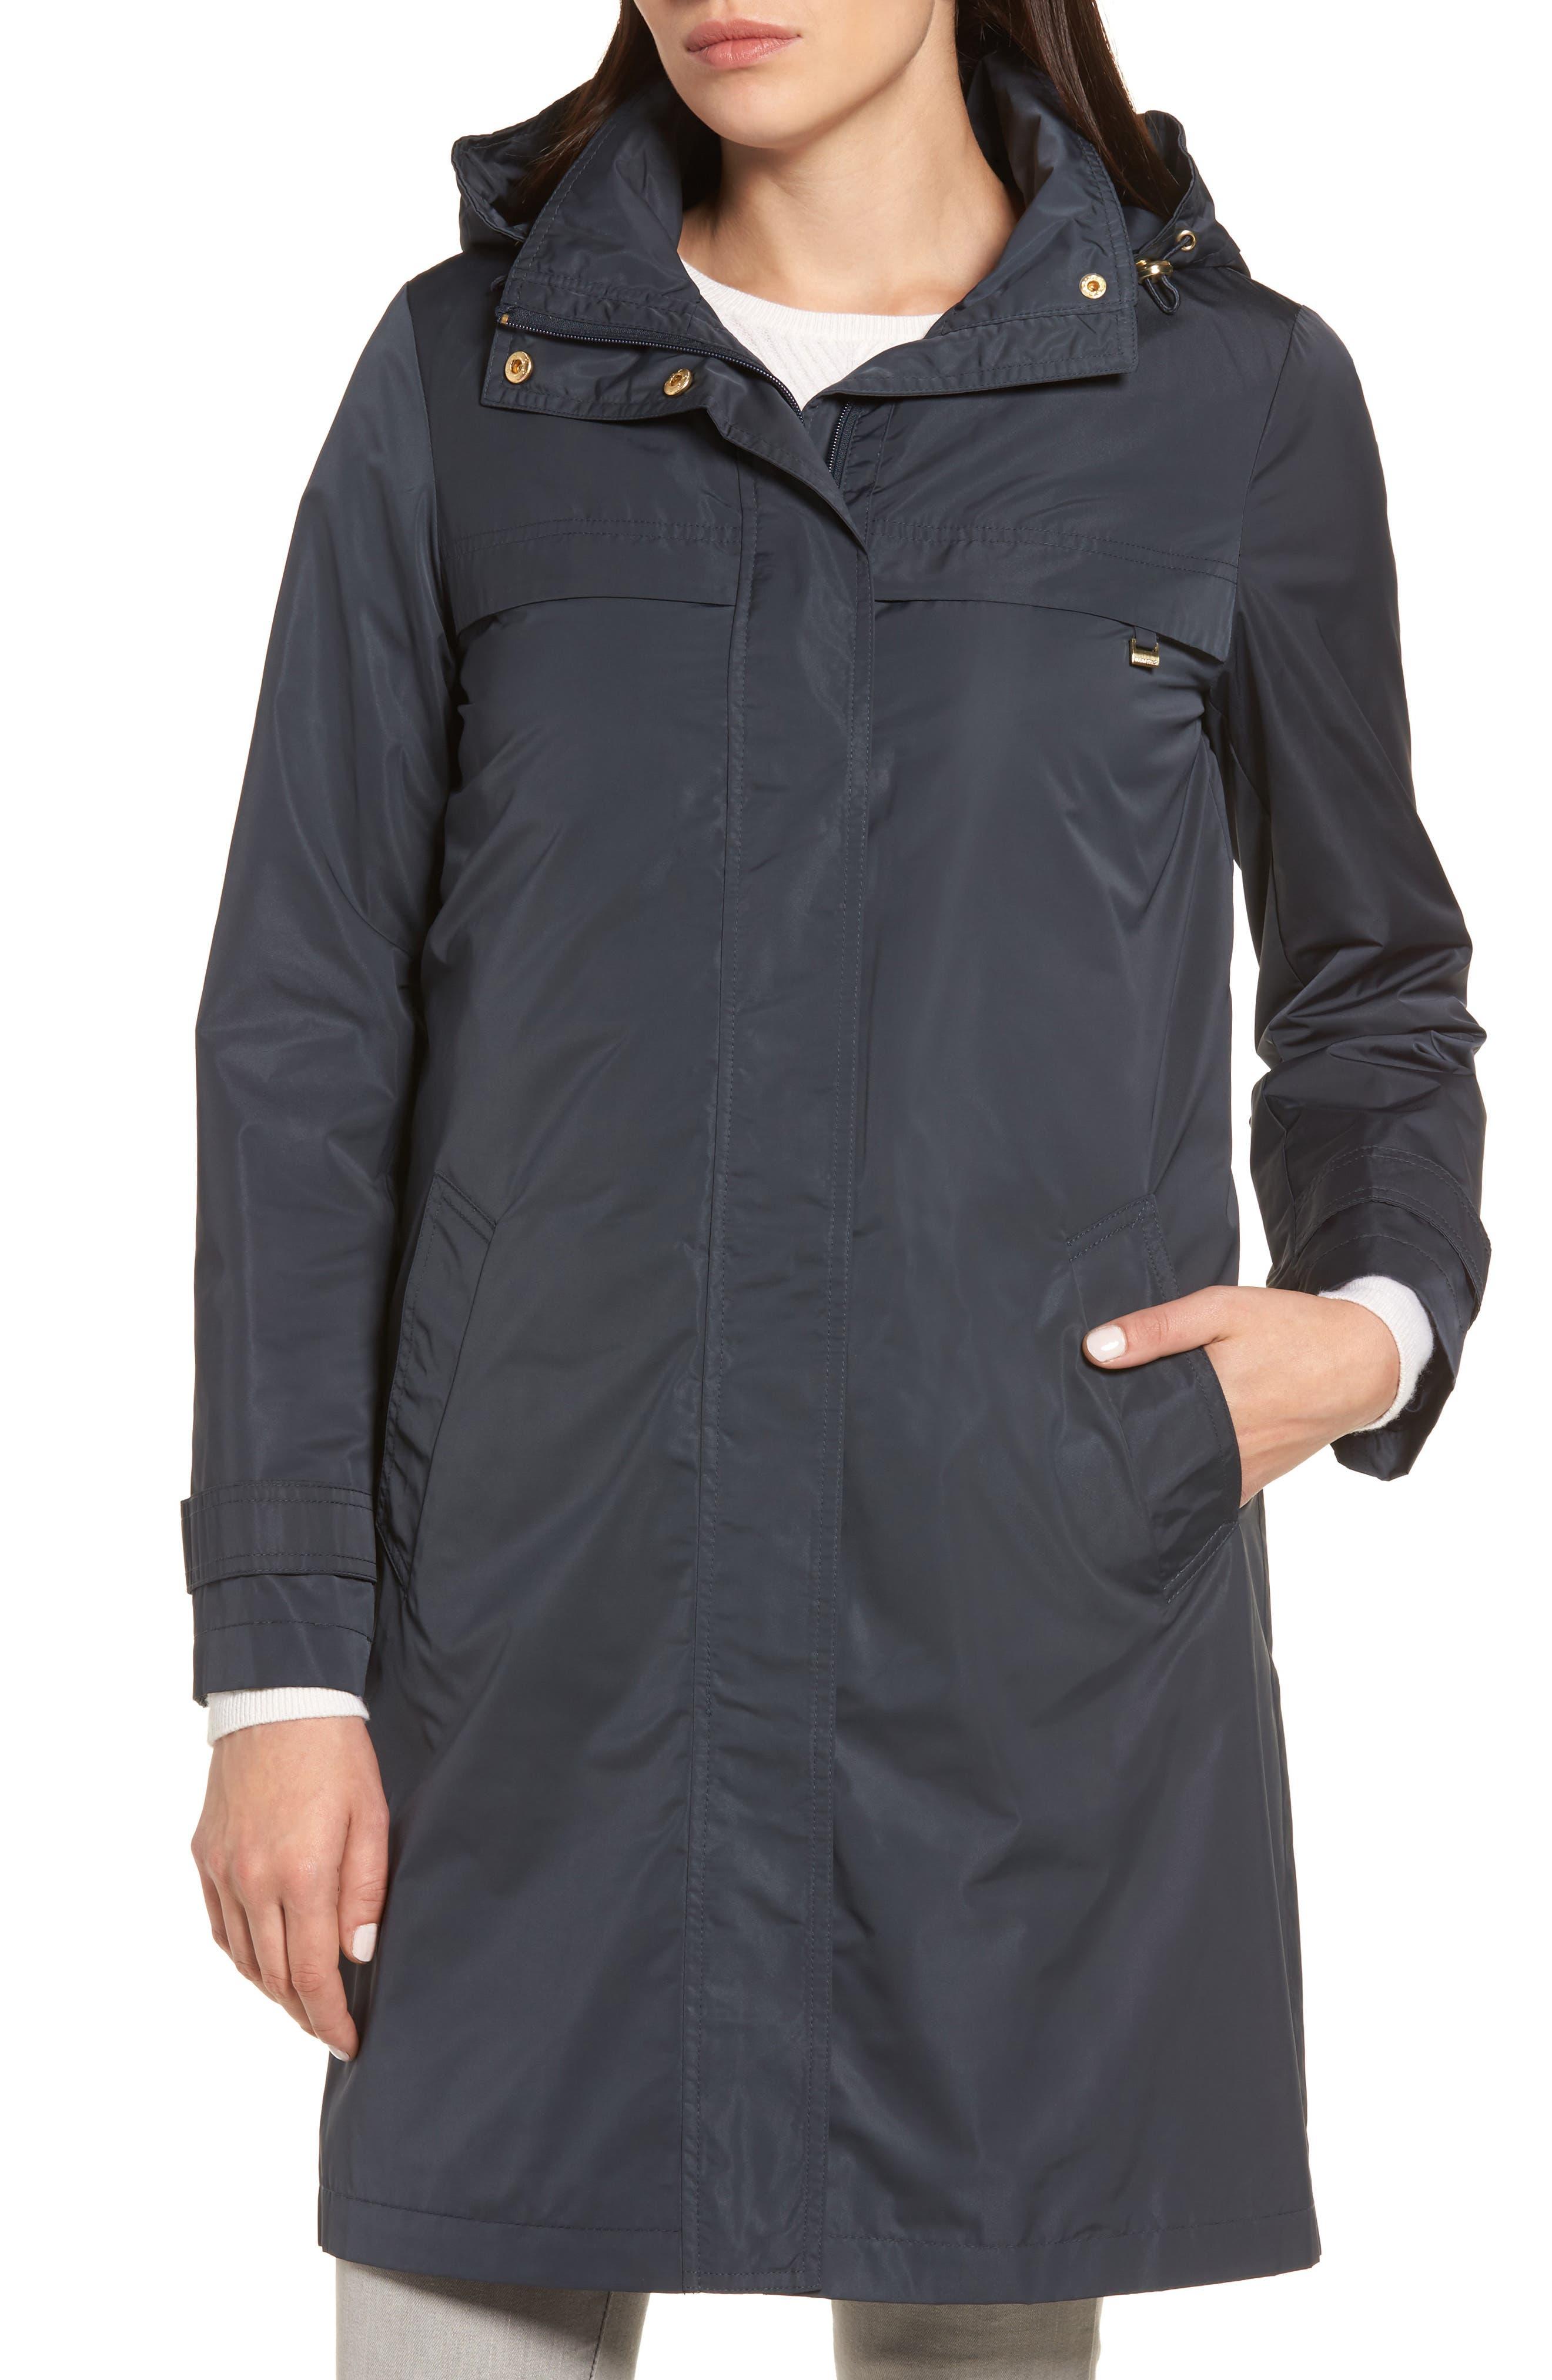 Raincoat with Detachable Hood,                         Main,                         color, Navy